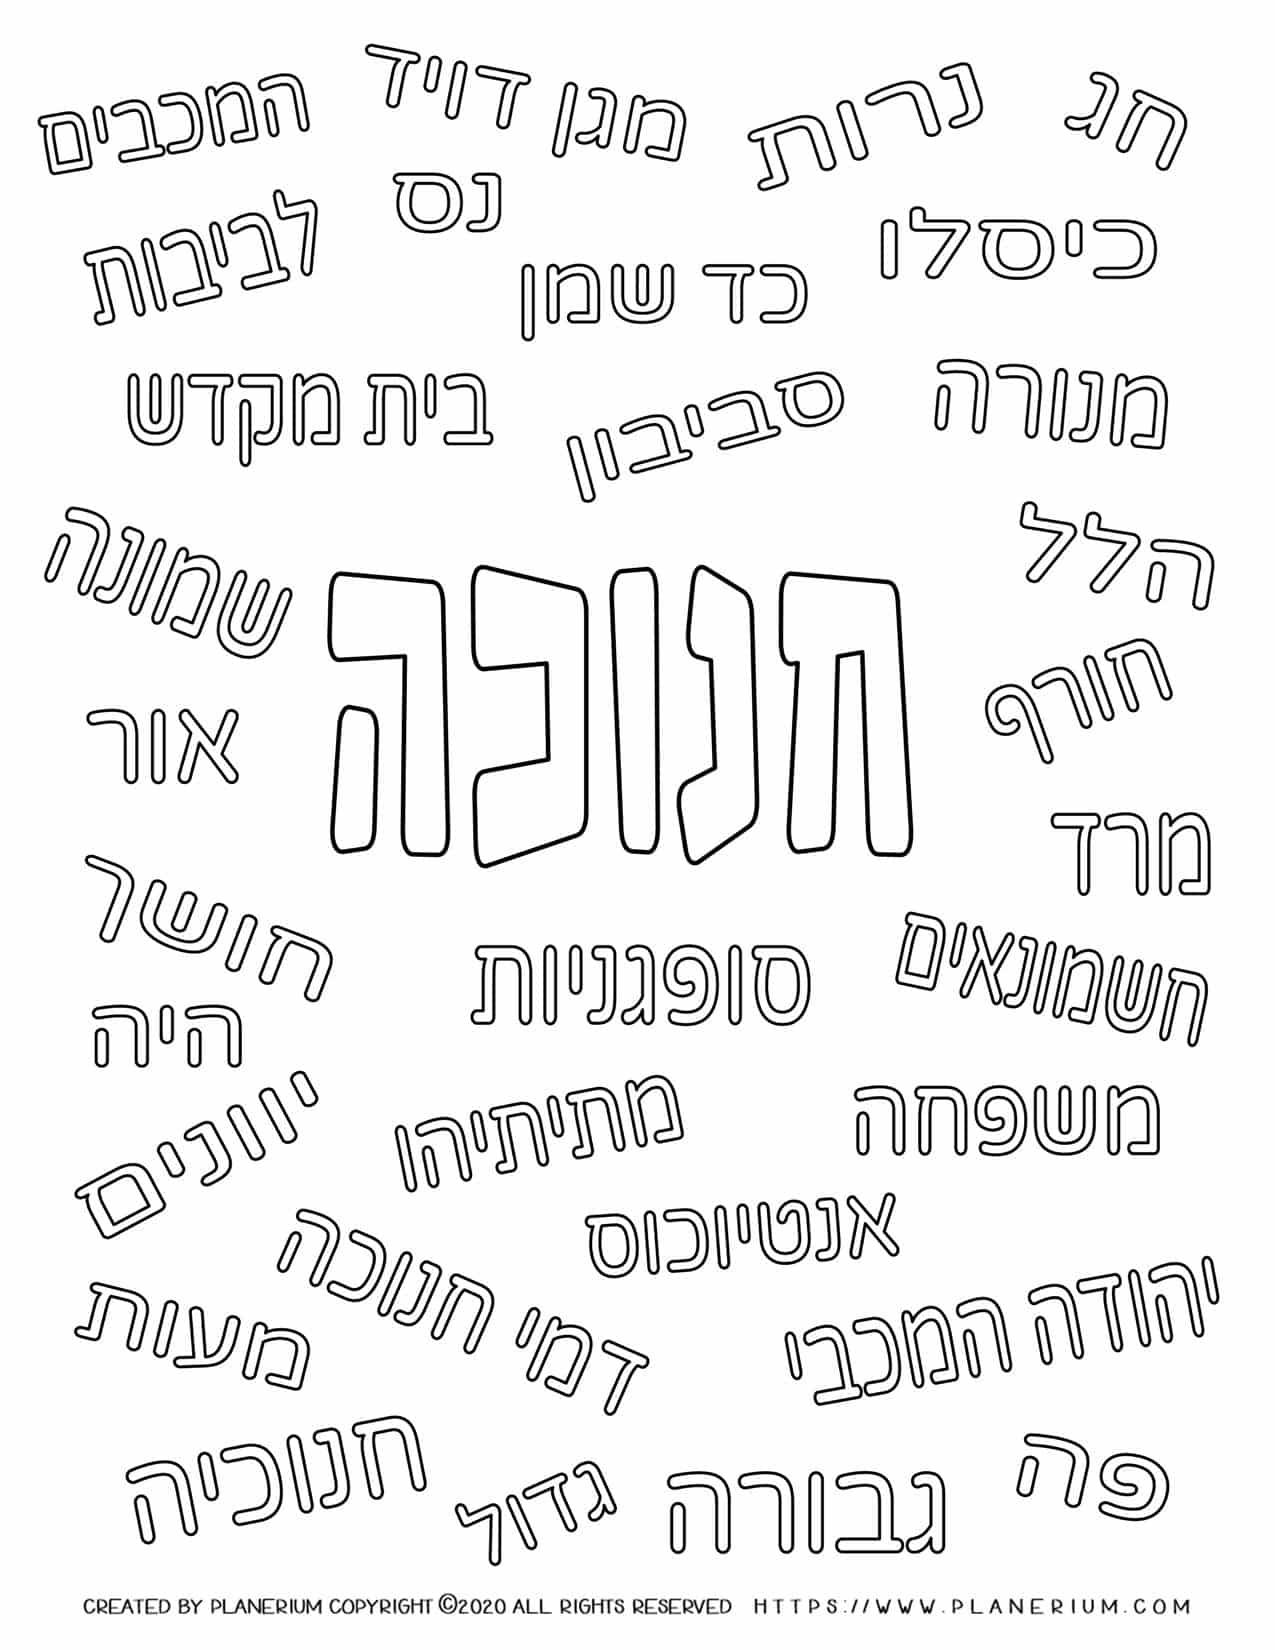 Hanukkah Coloring Page - Related Words - Hebrew - Free Printable   Planerium